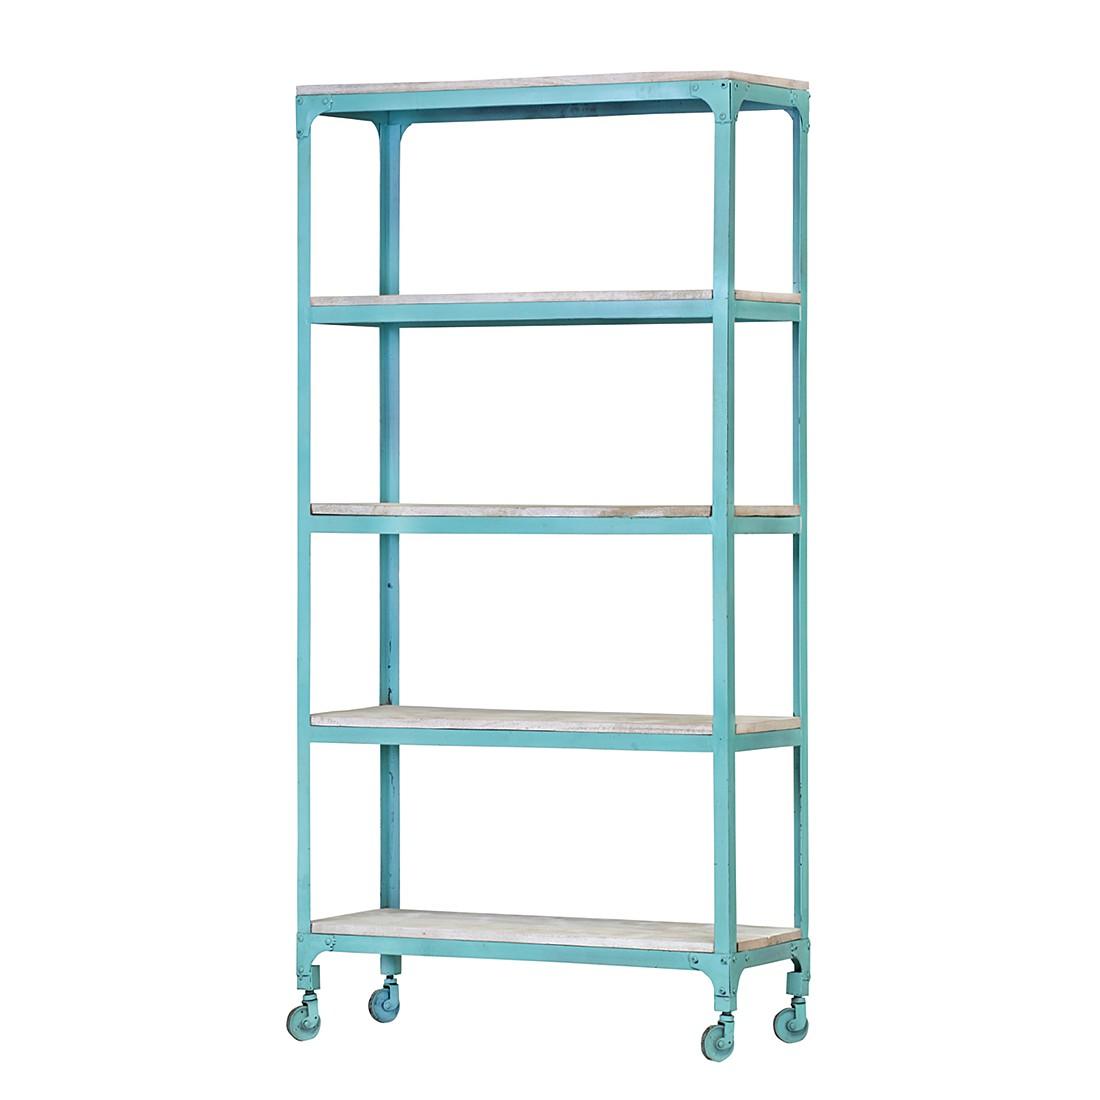 metallregal storm hellblau lackiert mit 5 b den. Black Bedroom Furniture Sets. Home Design Ideas